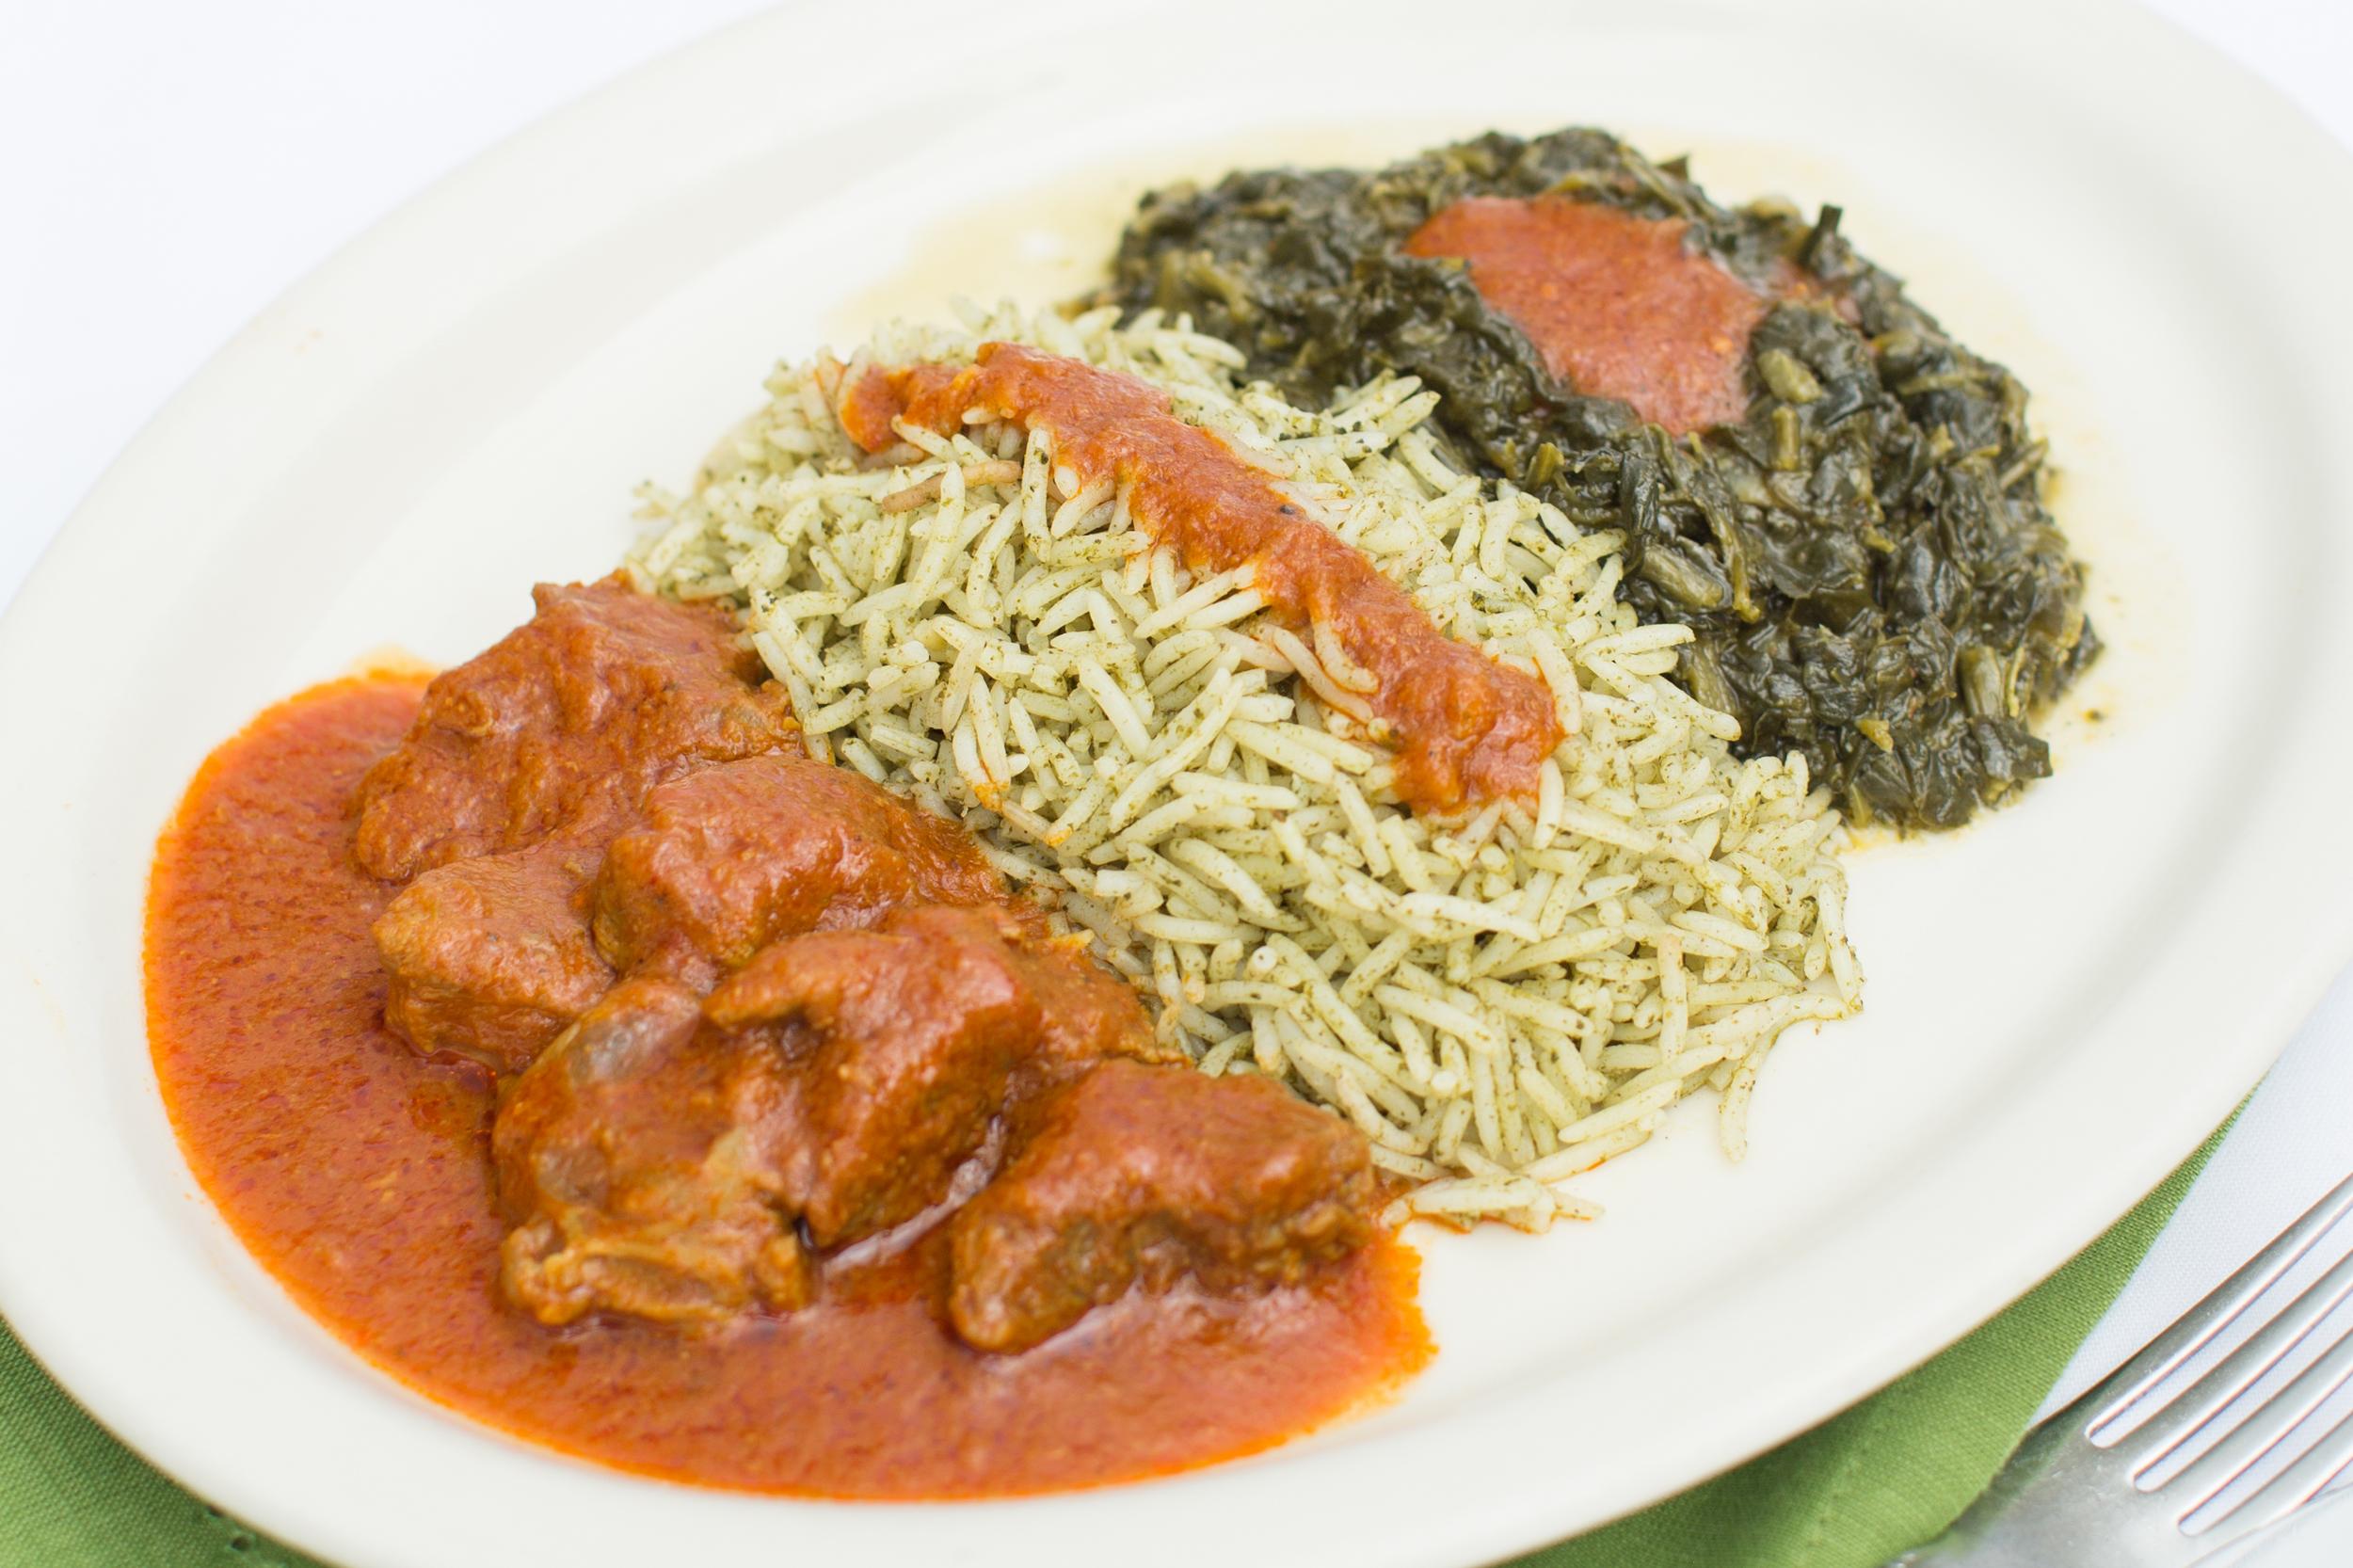 Panjshir-Cam-2-horizontal-10-nabu-food-photography.jpg